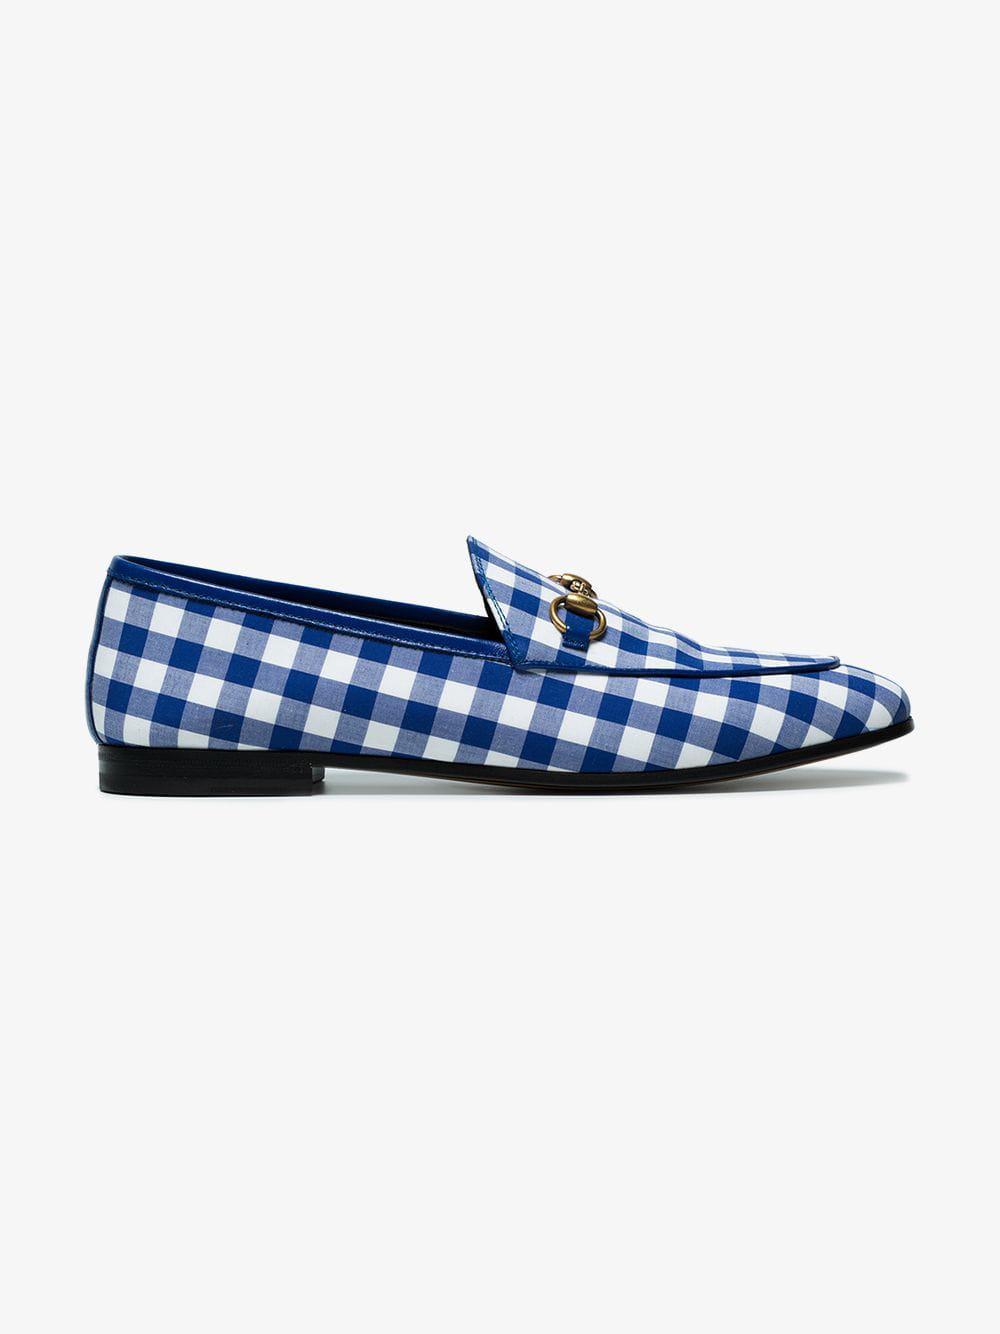 f5f3b92a950 Gucci Jordaan Horsebit Gingham Loafers in Blue - Lyst